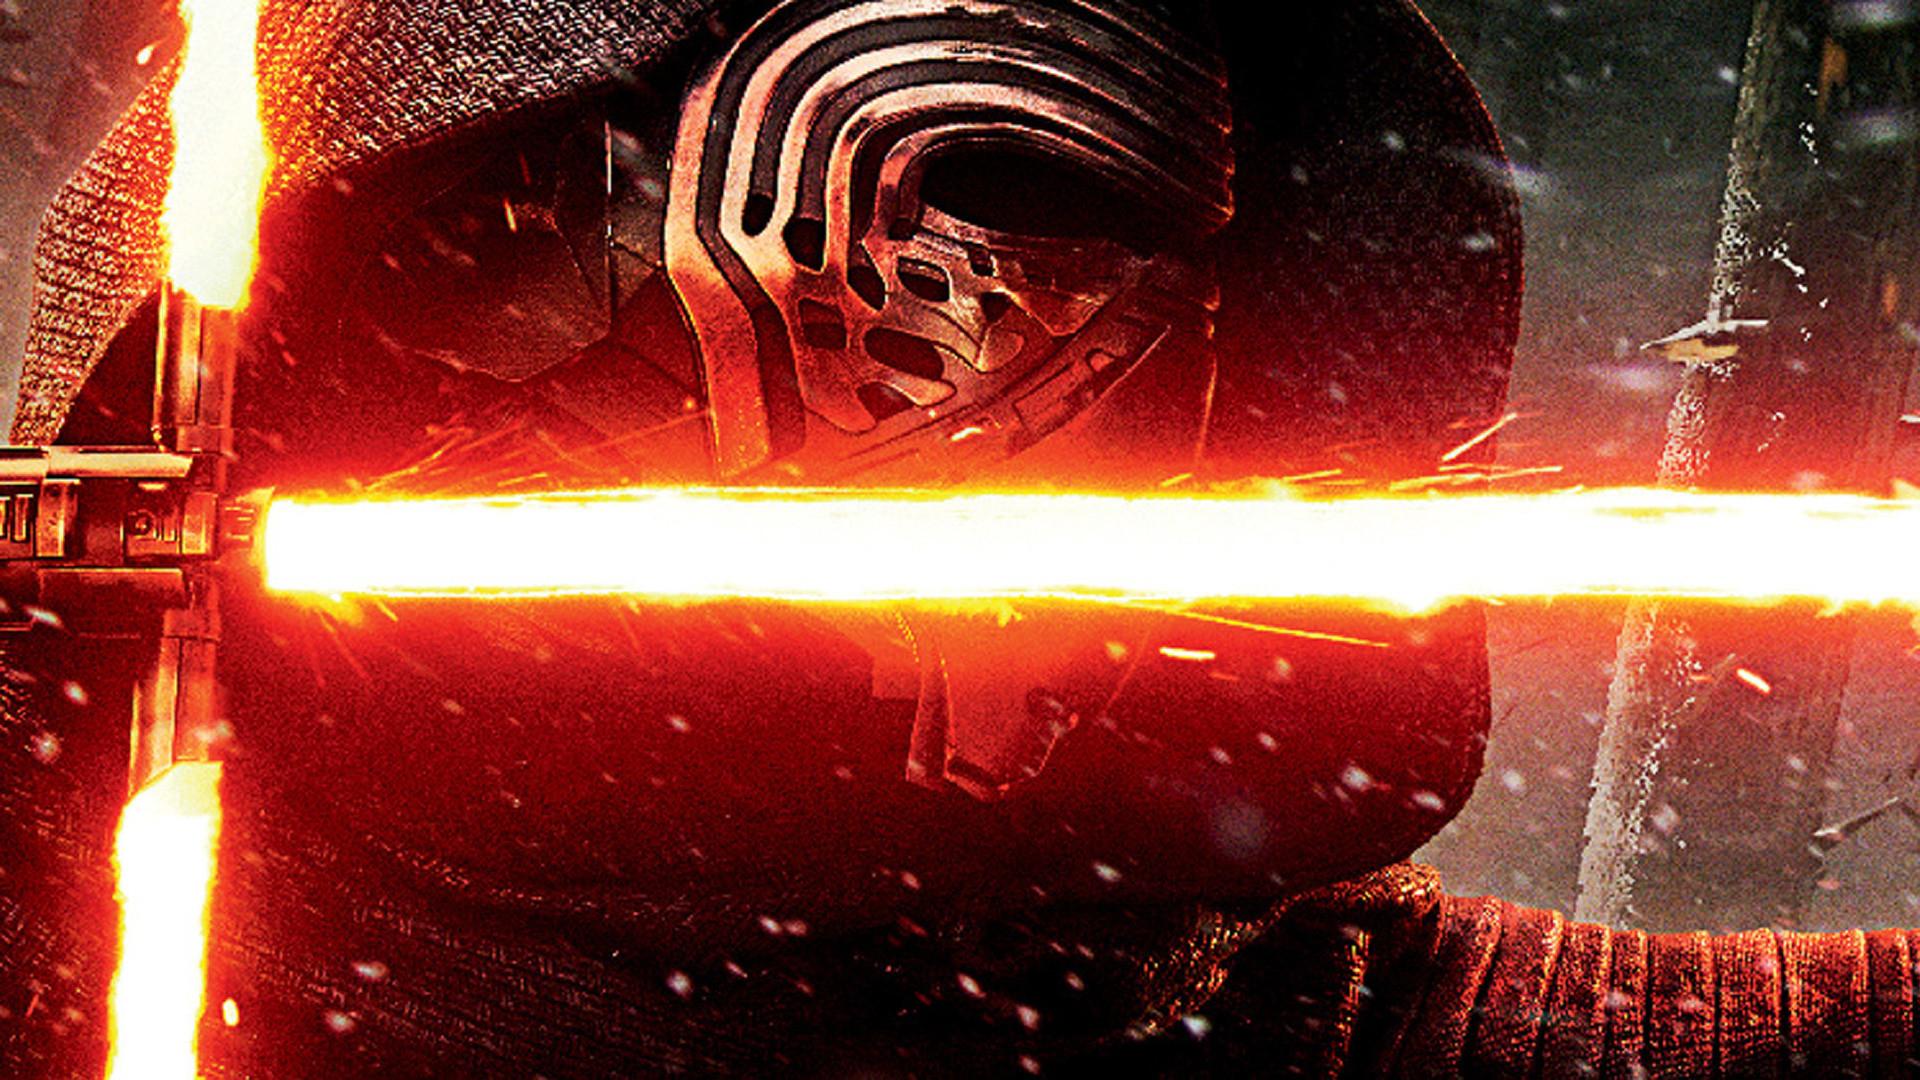 Movie – Star Wars Episode VII: The Force Awakens Kylo Ren Wallpaper